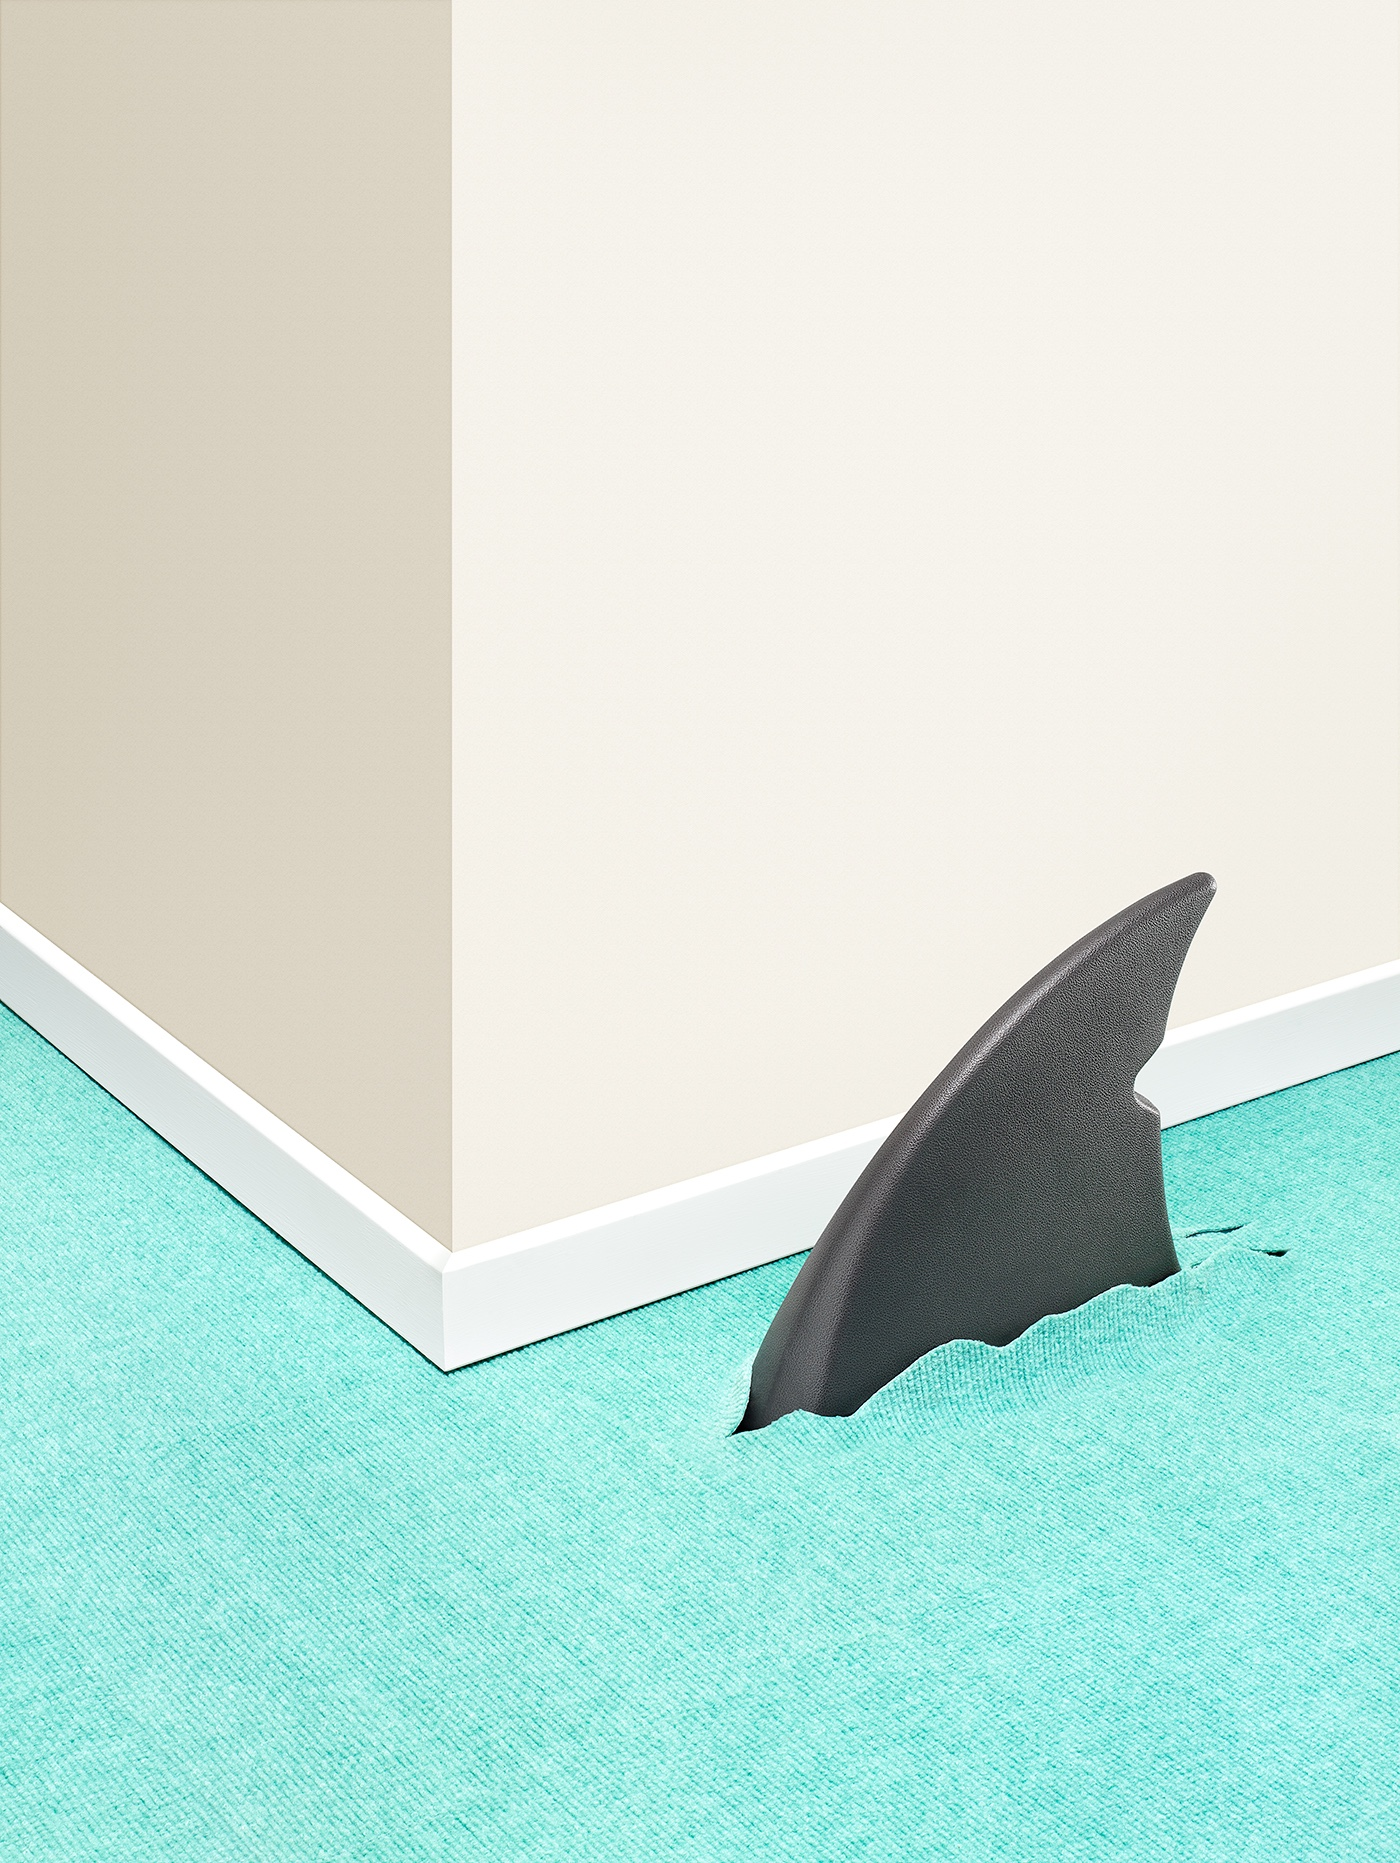 https://tickertapecdn.tdameritrade.com/assets/images/pages/md/Shark fin rounding corner wall through carpet